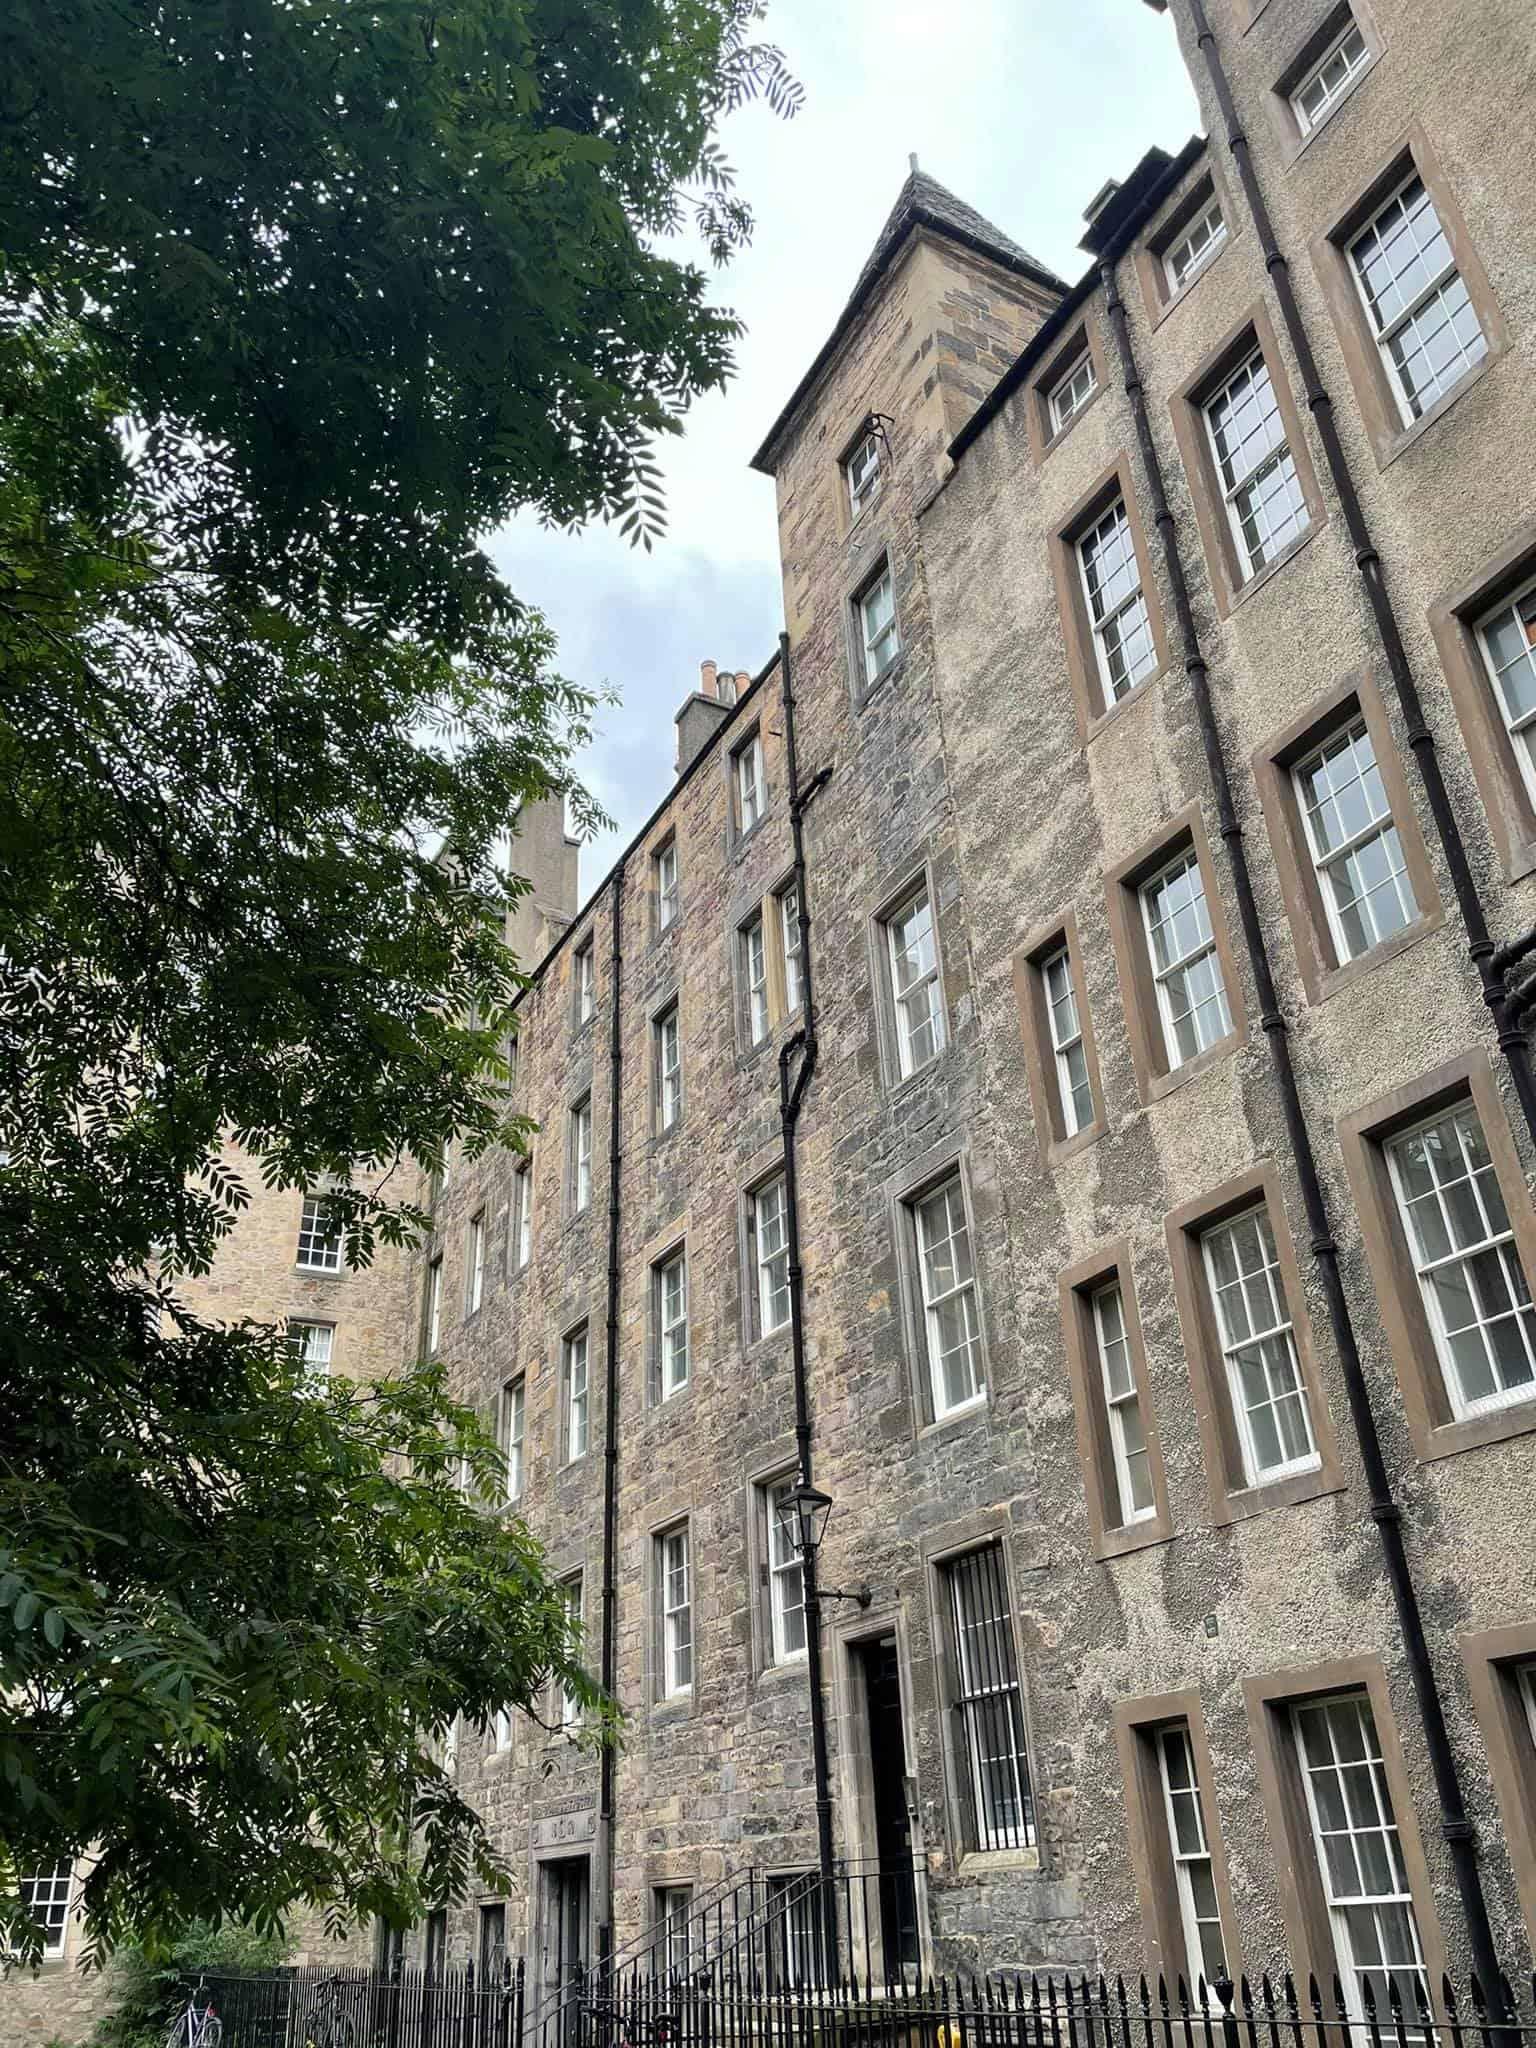 Two day Edinburgh itinerary